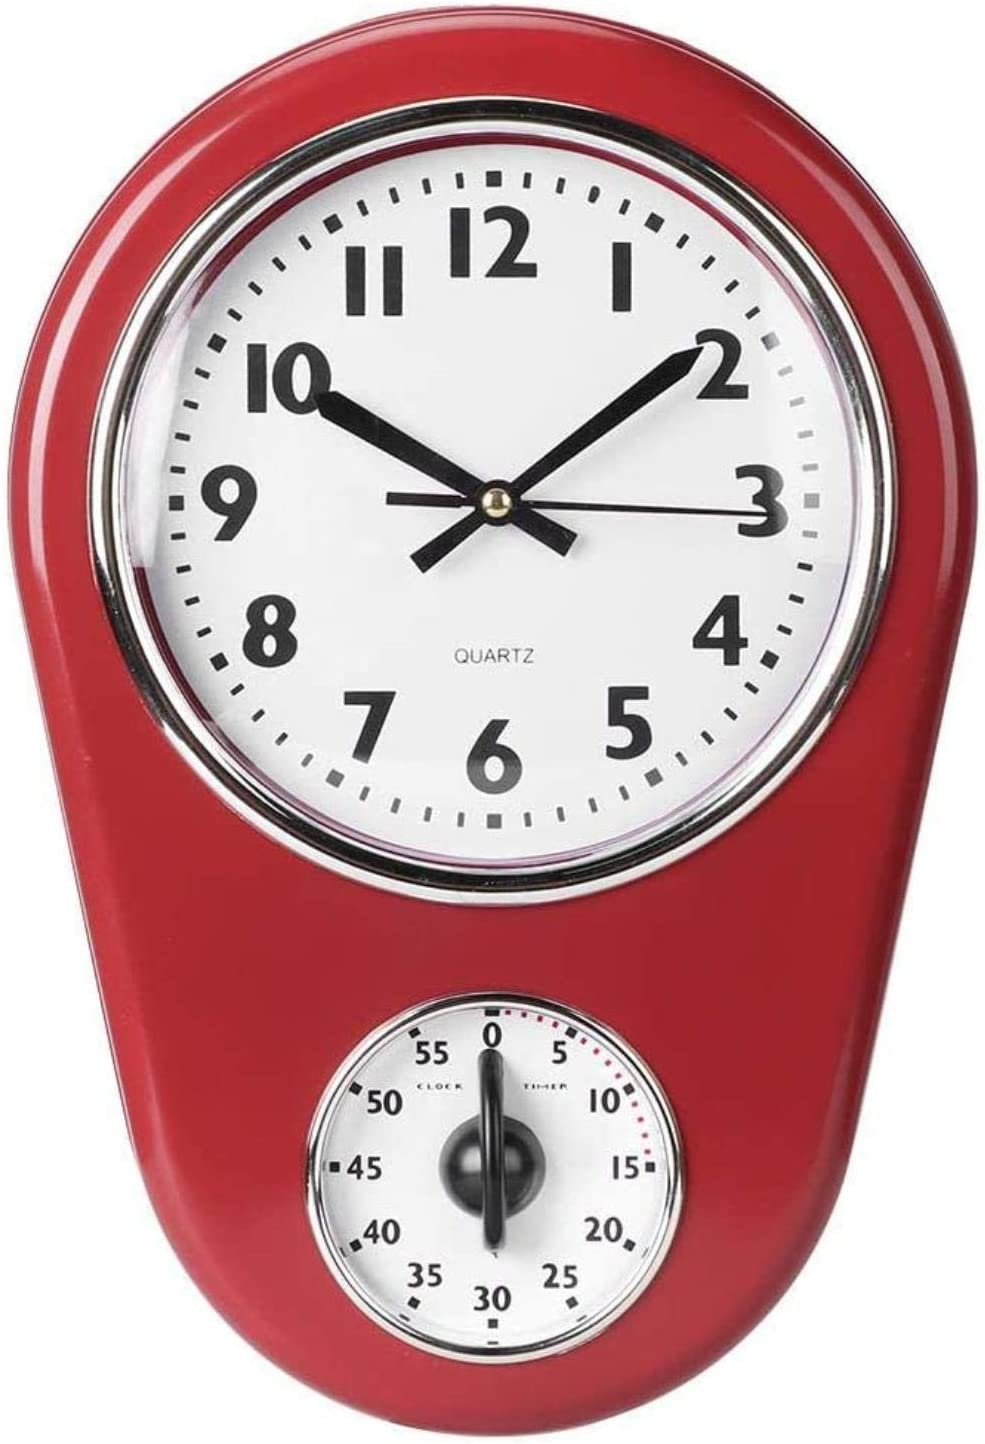 Wall Clock Vintage Simple Ranking TOP10 Watch Elegant Super-cheap Hanging Big L